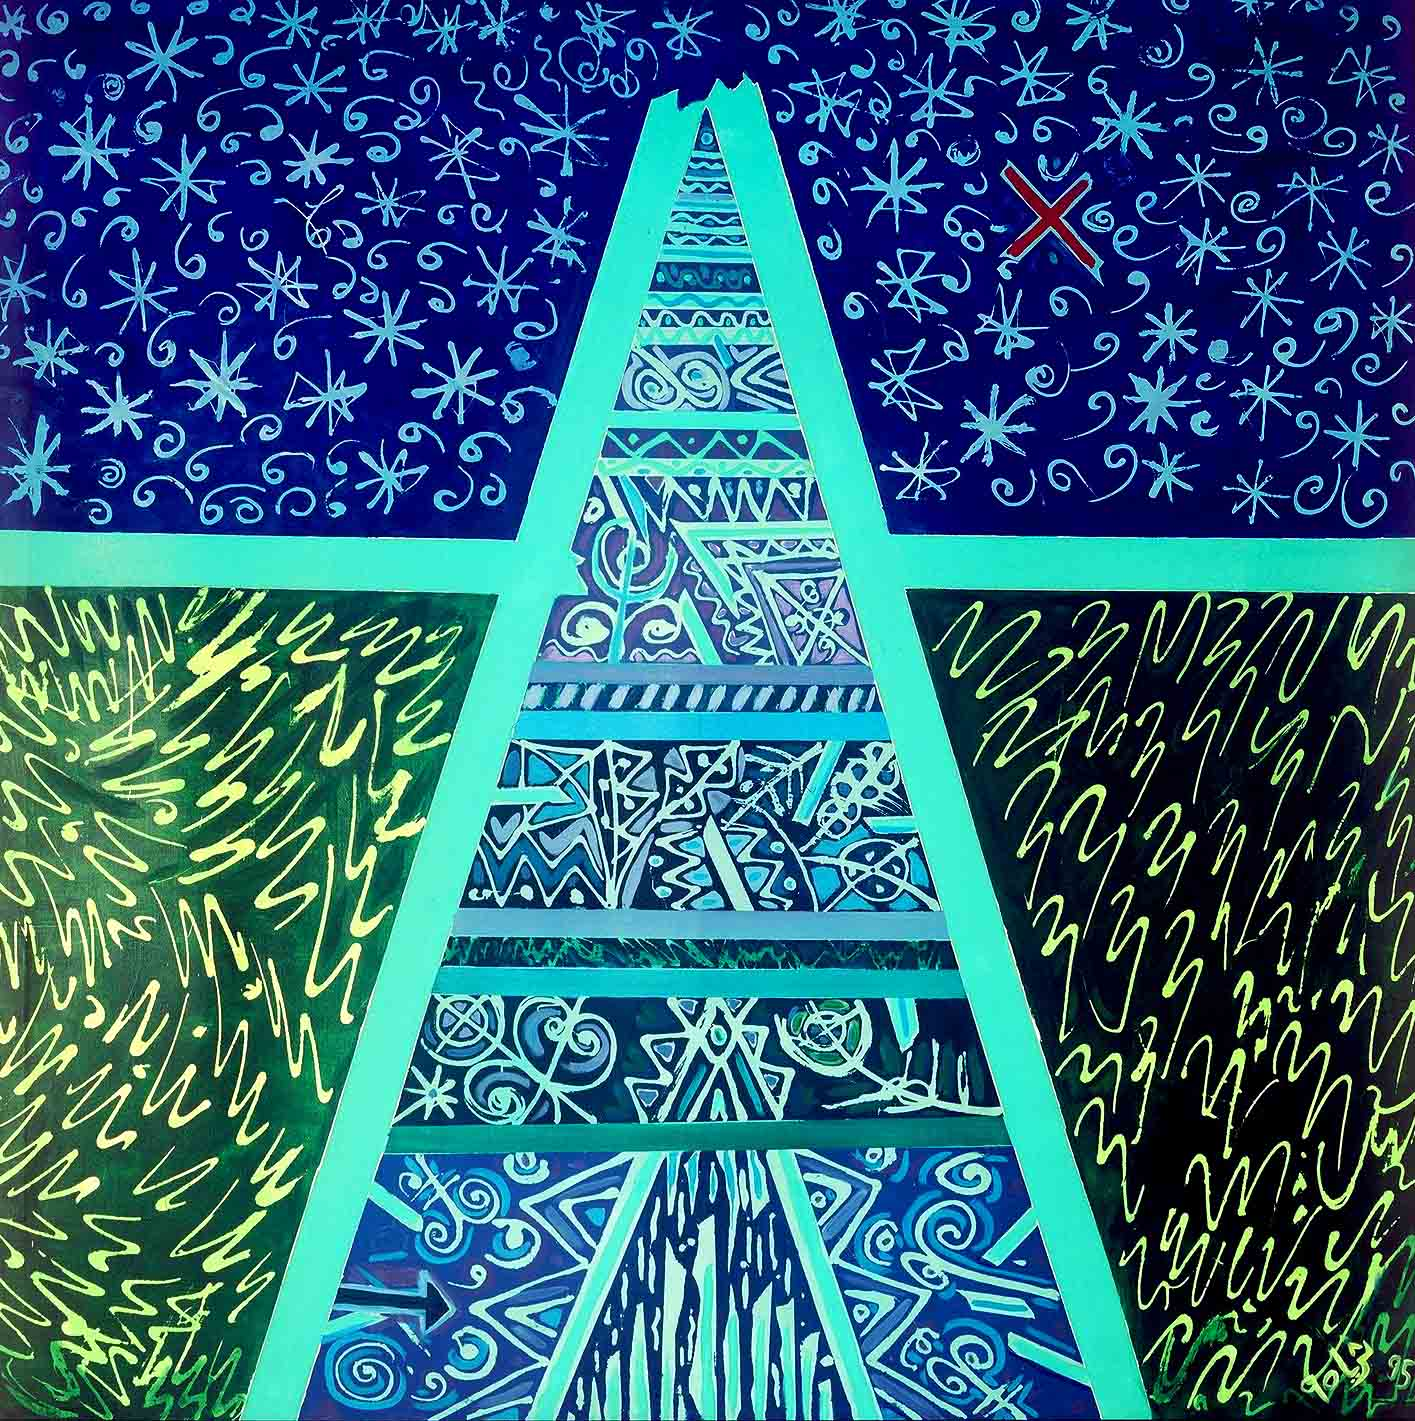 Pyramid of Life, 1995